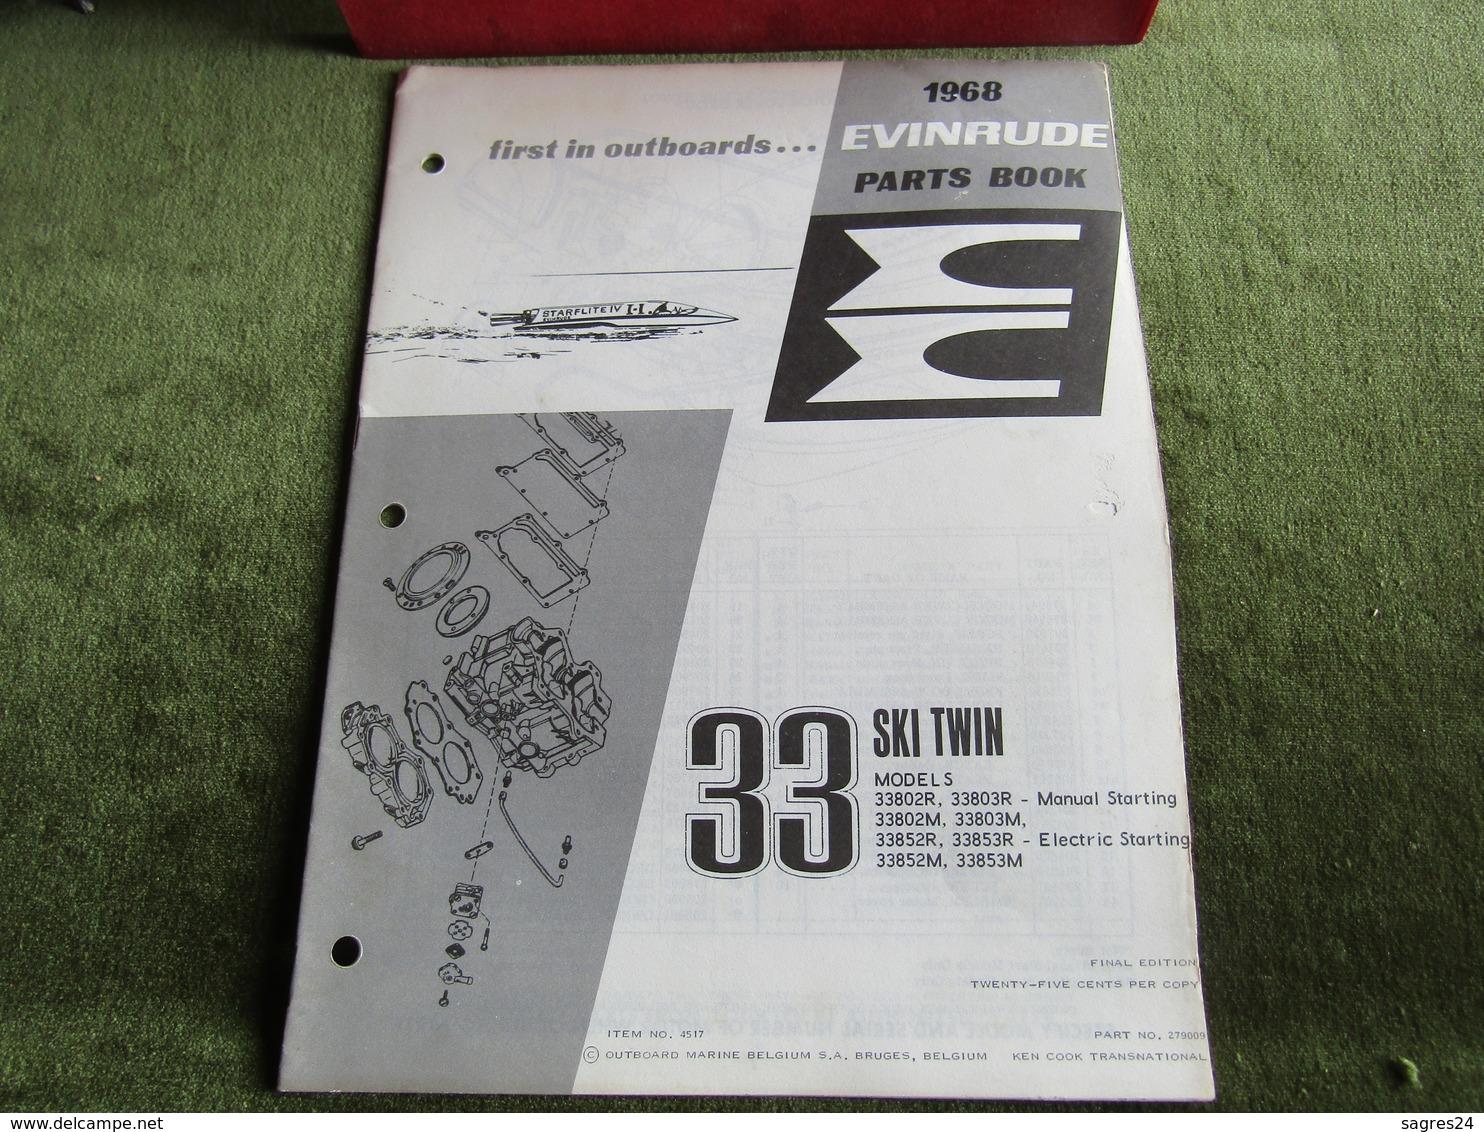 Evinrude Outboard 33 Ski Twin Model S Parts Book 1968 - Boats